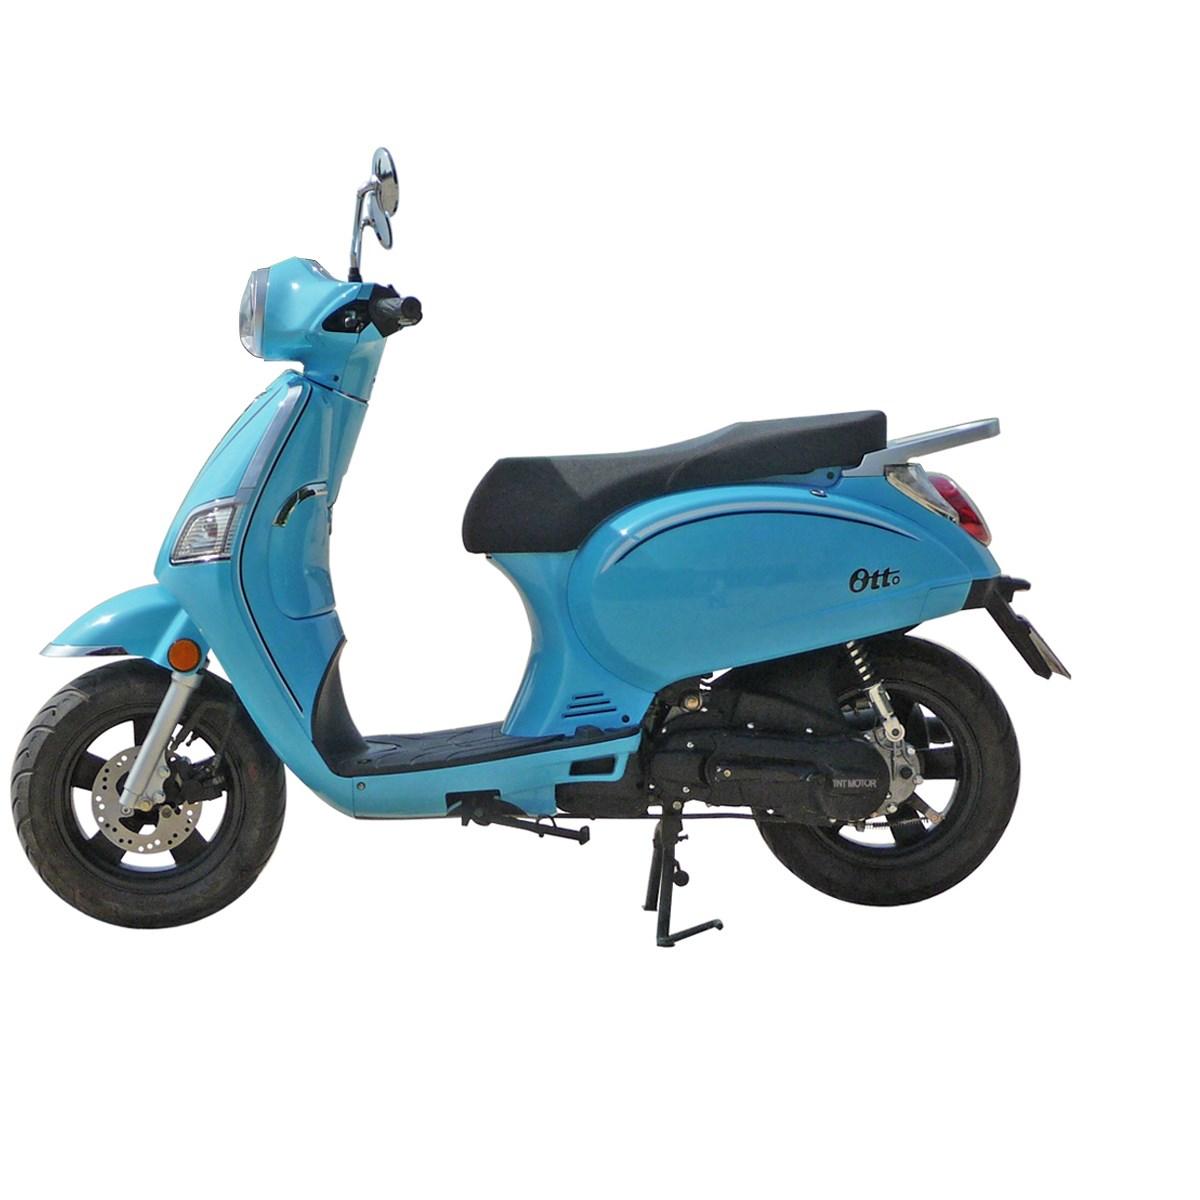 scooter tnt motor otto 2 temps 50cc 12 bleu caraman vert motoculture. Black Bedroom Furniture Sets. Home Design Ideas